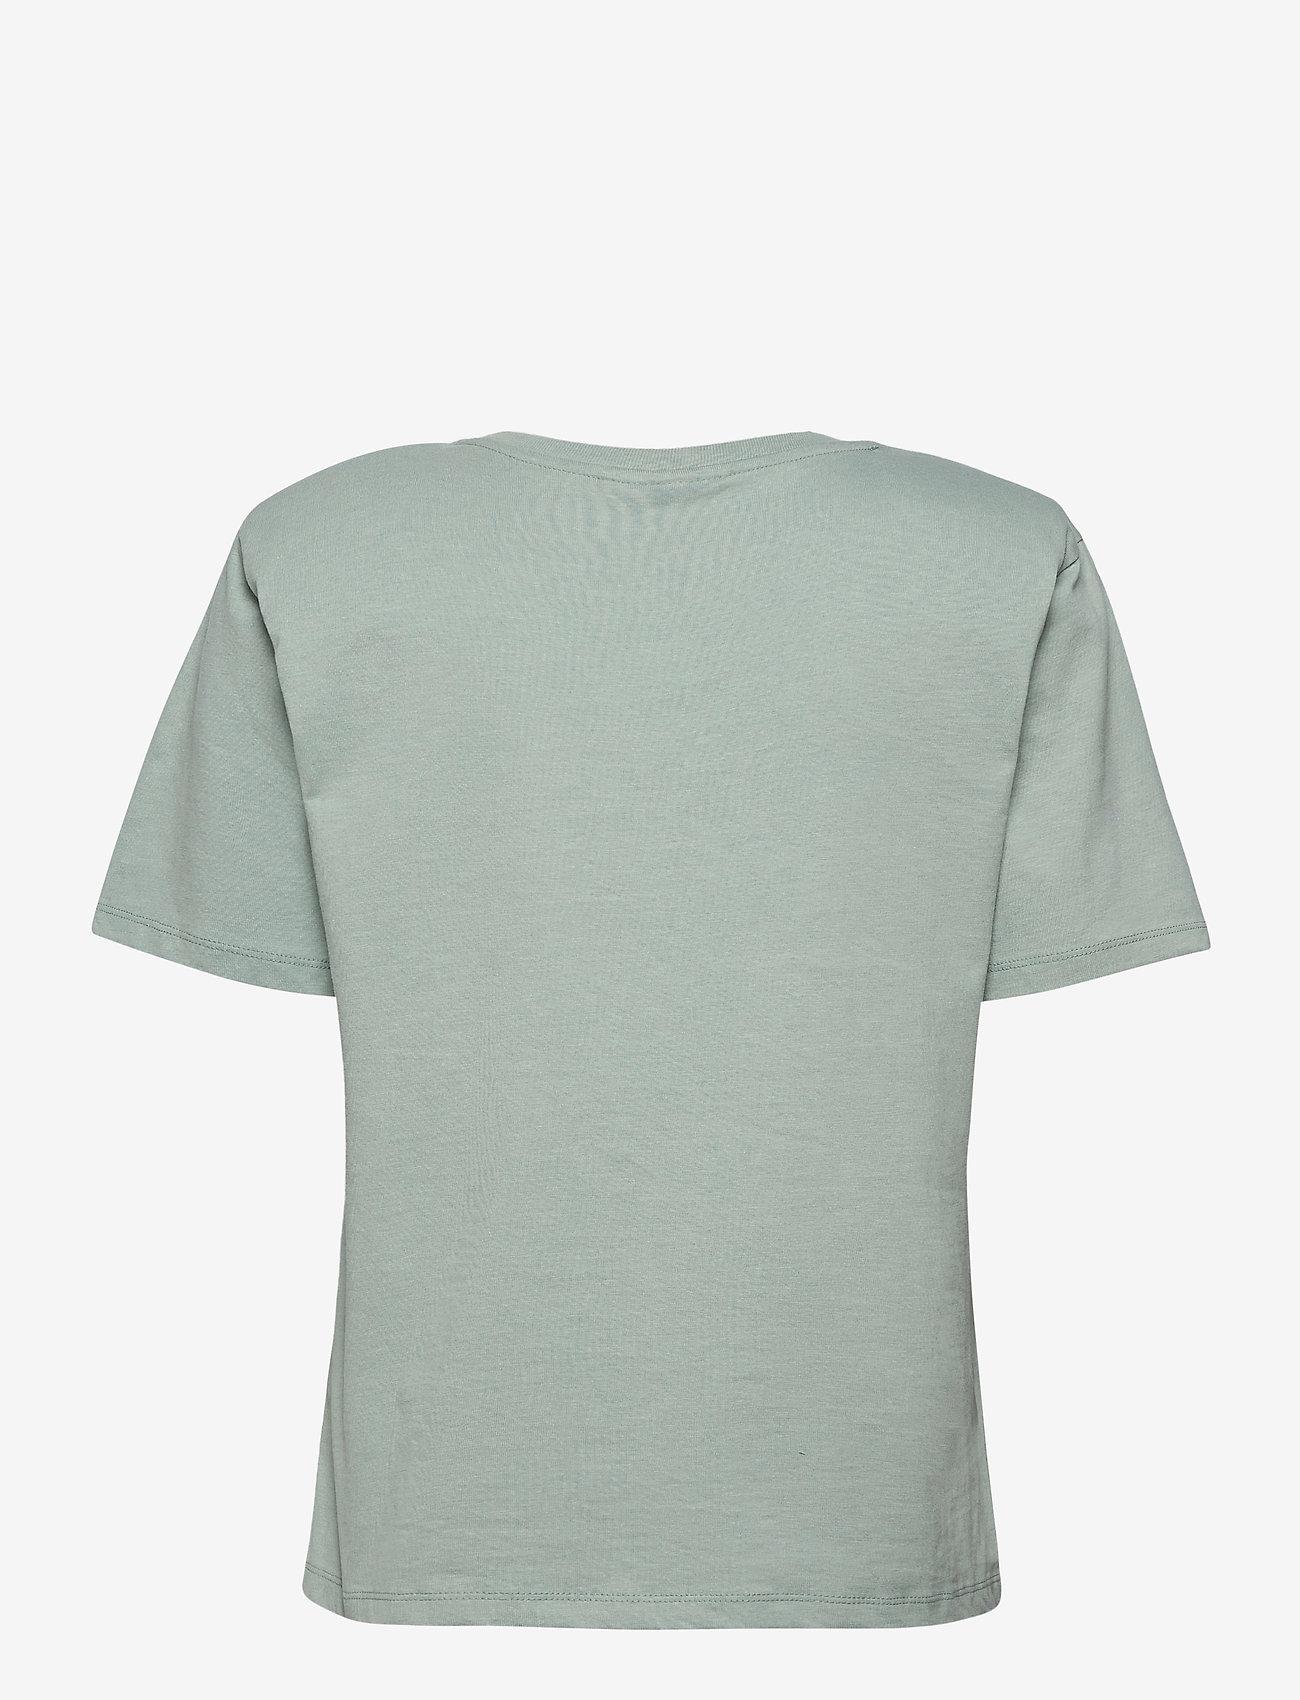 Gestuz - JoryGZ tee - t-shirts - slate gray - 2